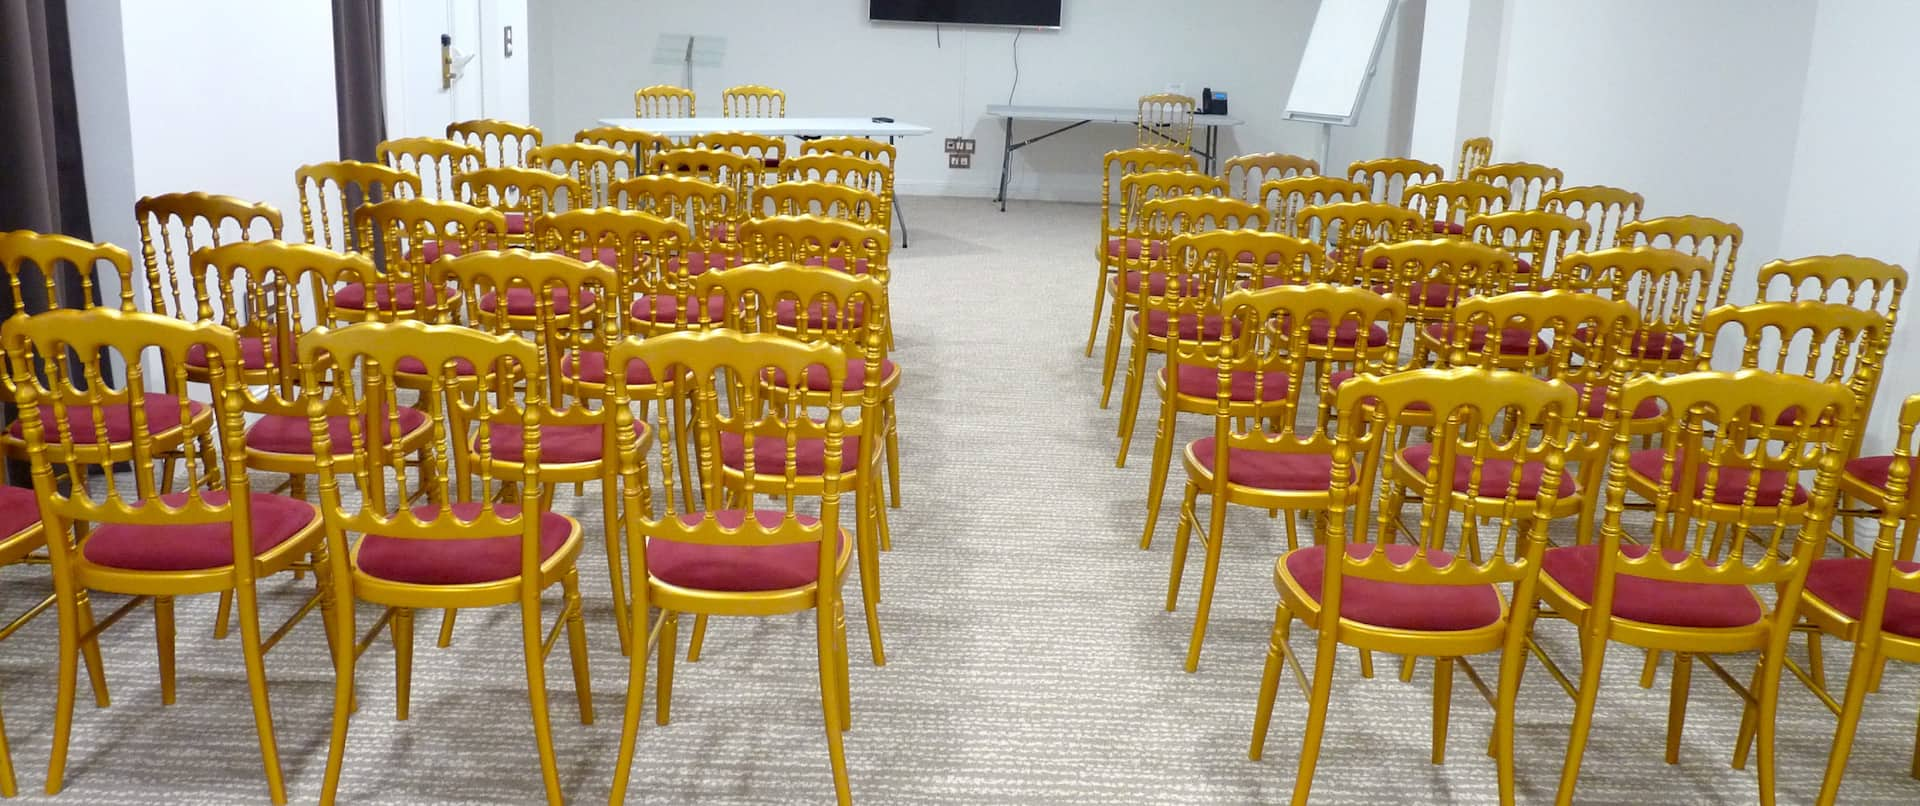 Vespucci Meeting Room Area